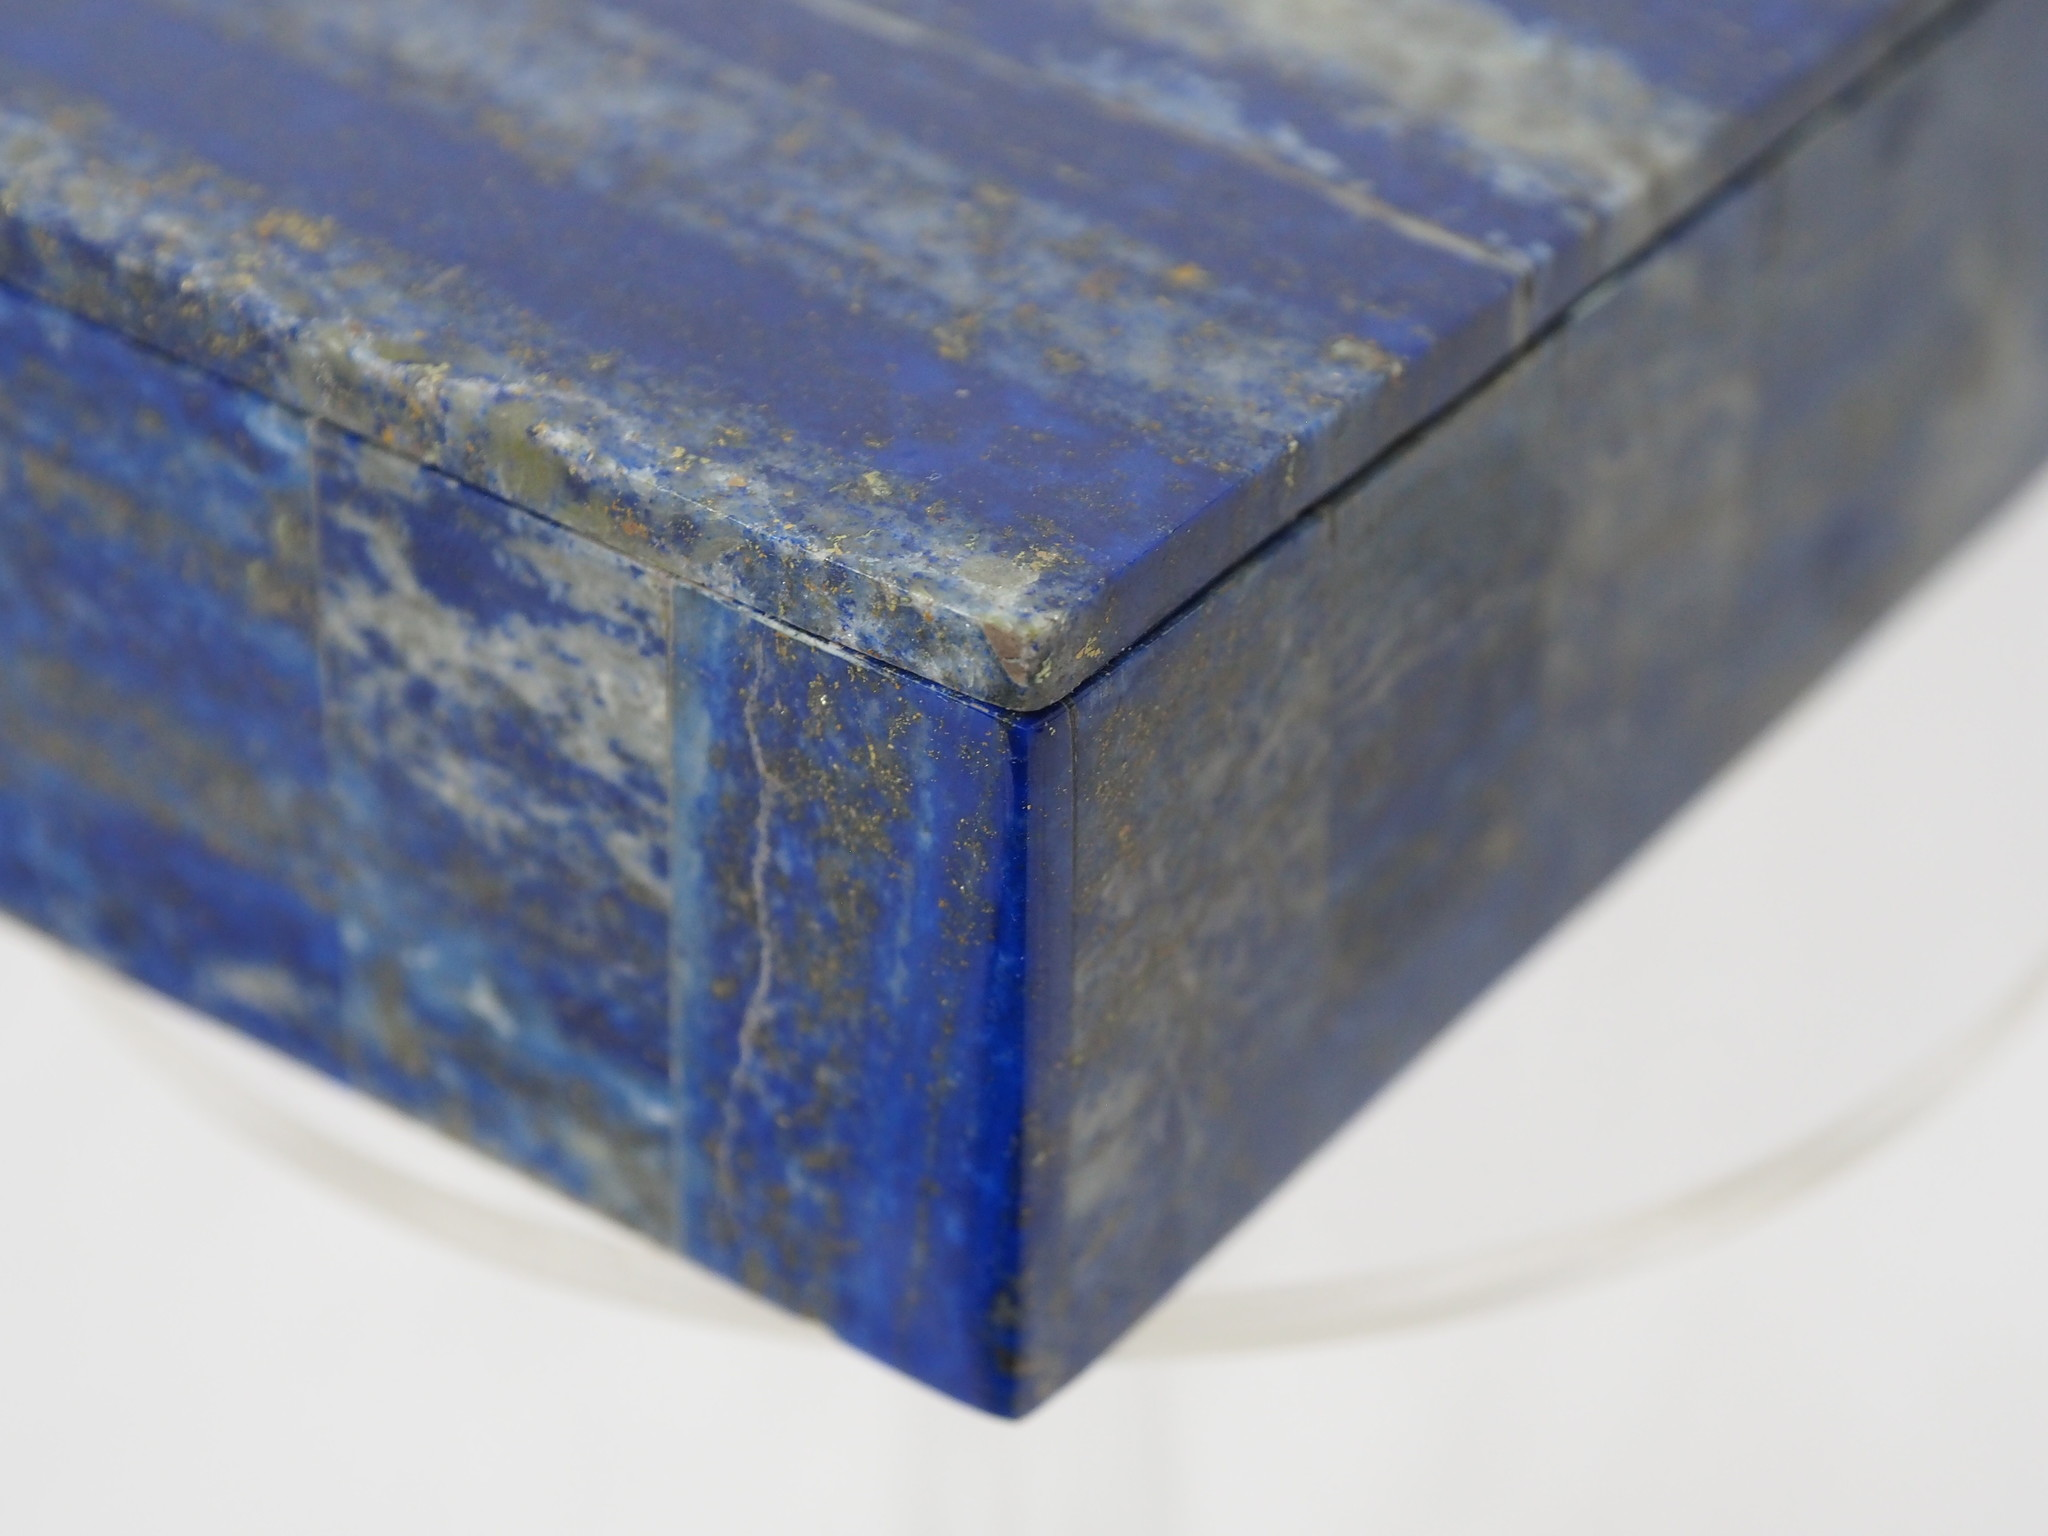 Extravagant Royal blau echt Lapis lazuli Schmuckkiste aus Afghanistan   Nr- 21/F